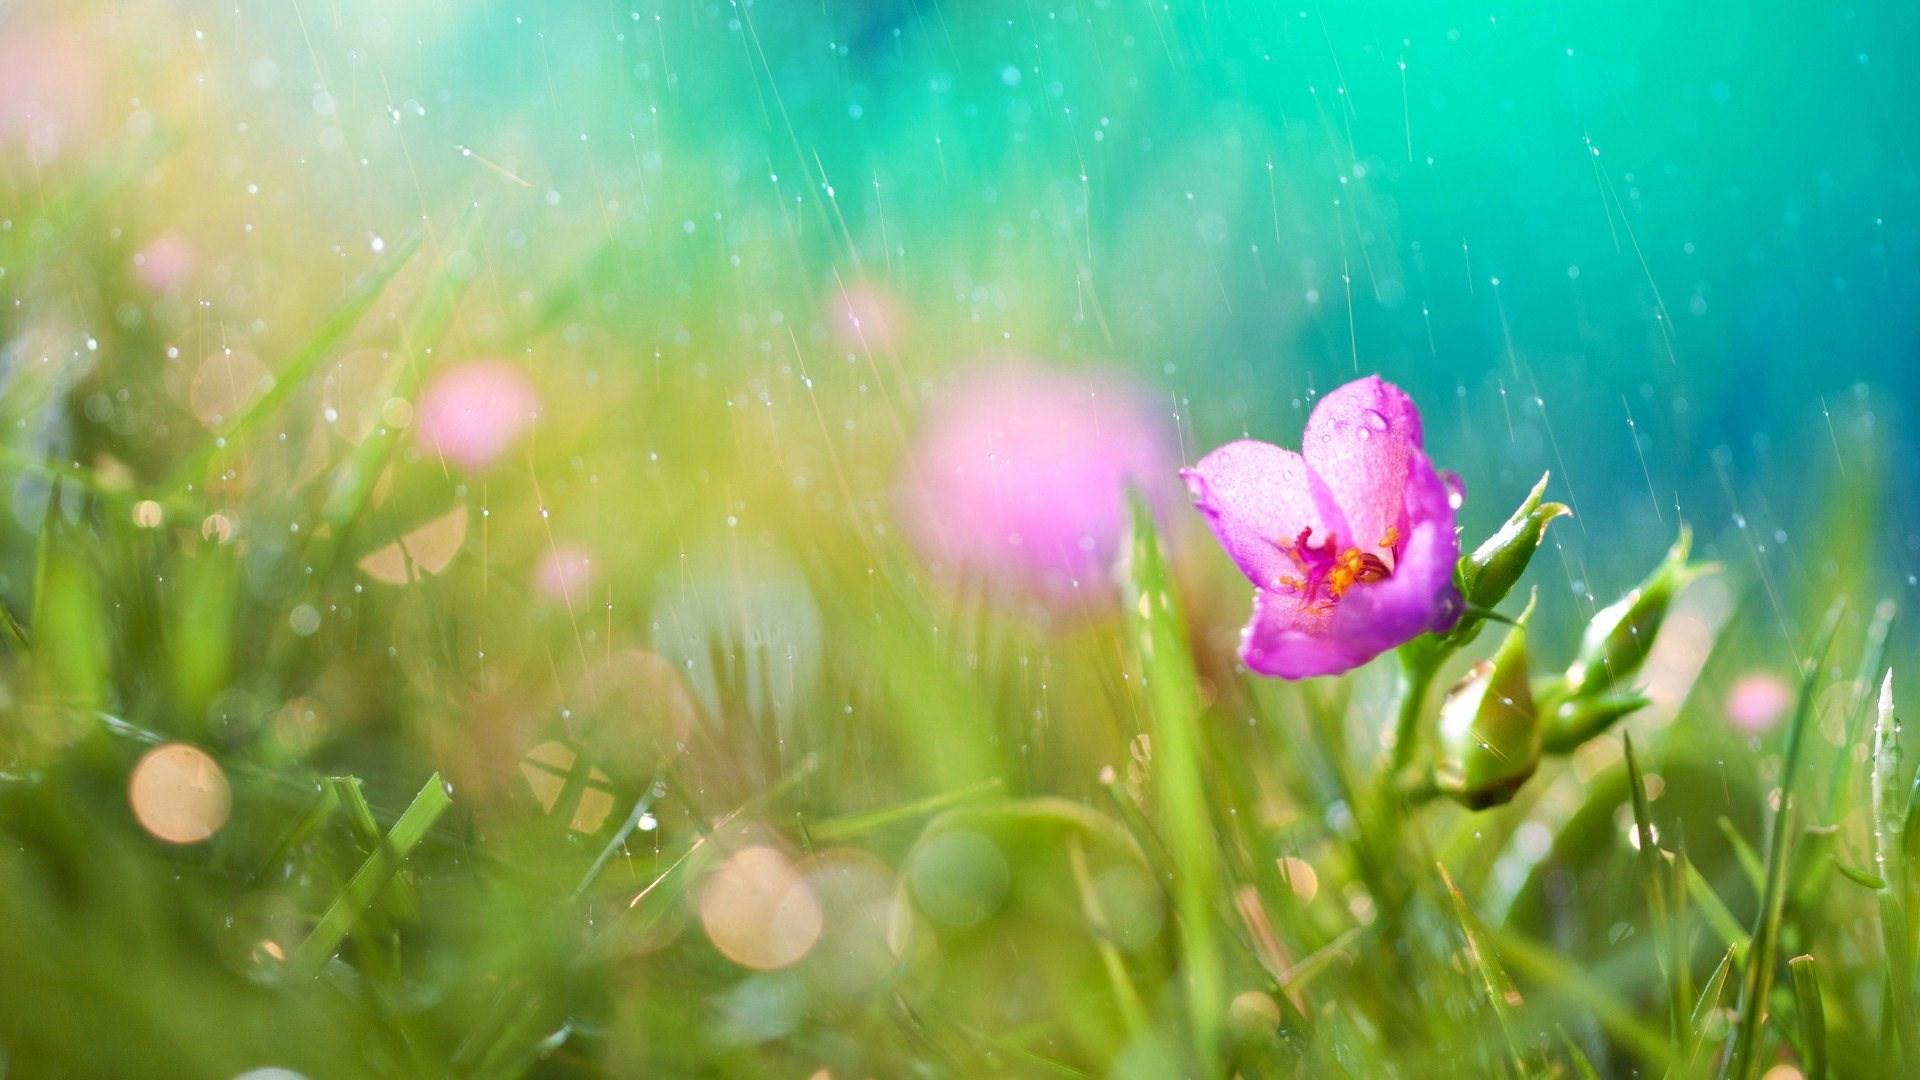 Braylen-Butler-rain-theme-background-images-1920-x-1080-px-wallpaper-wpc5803041